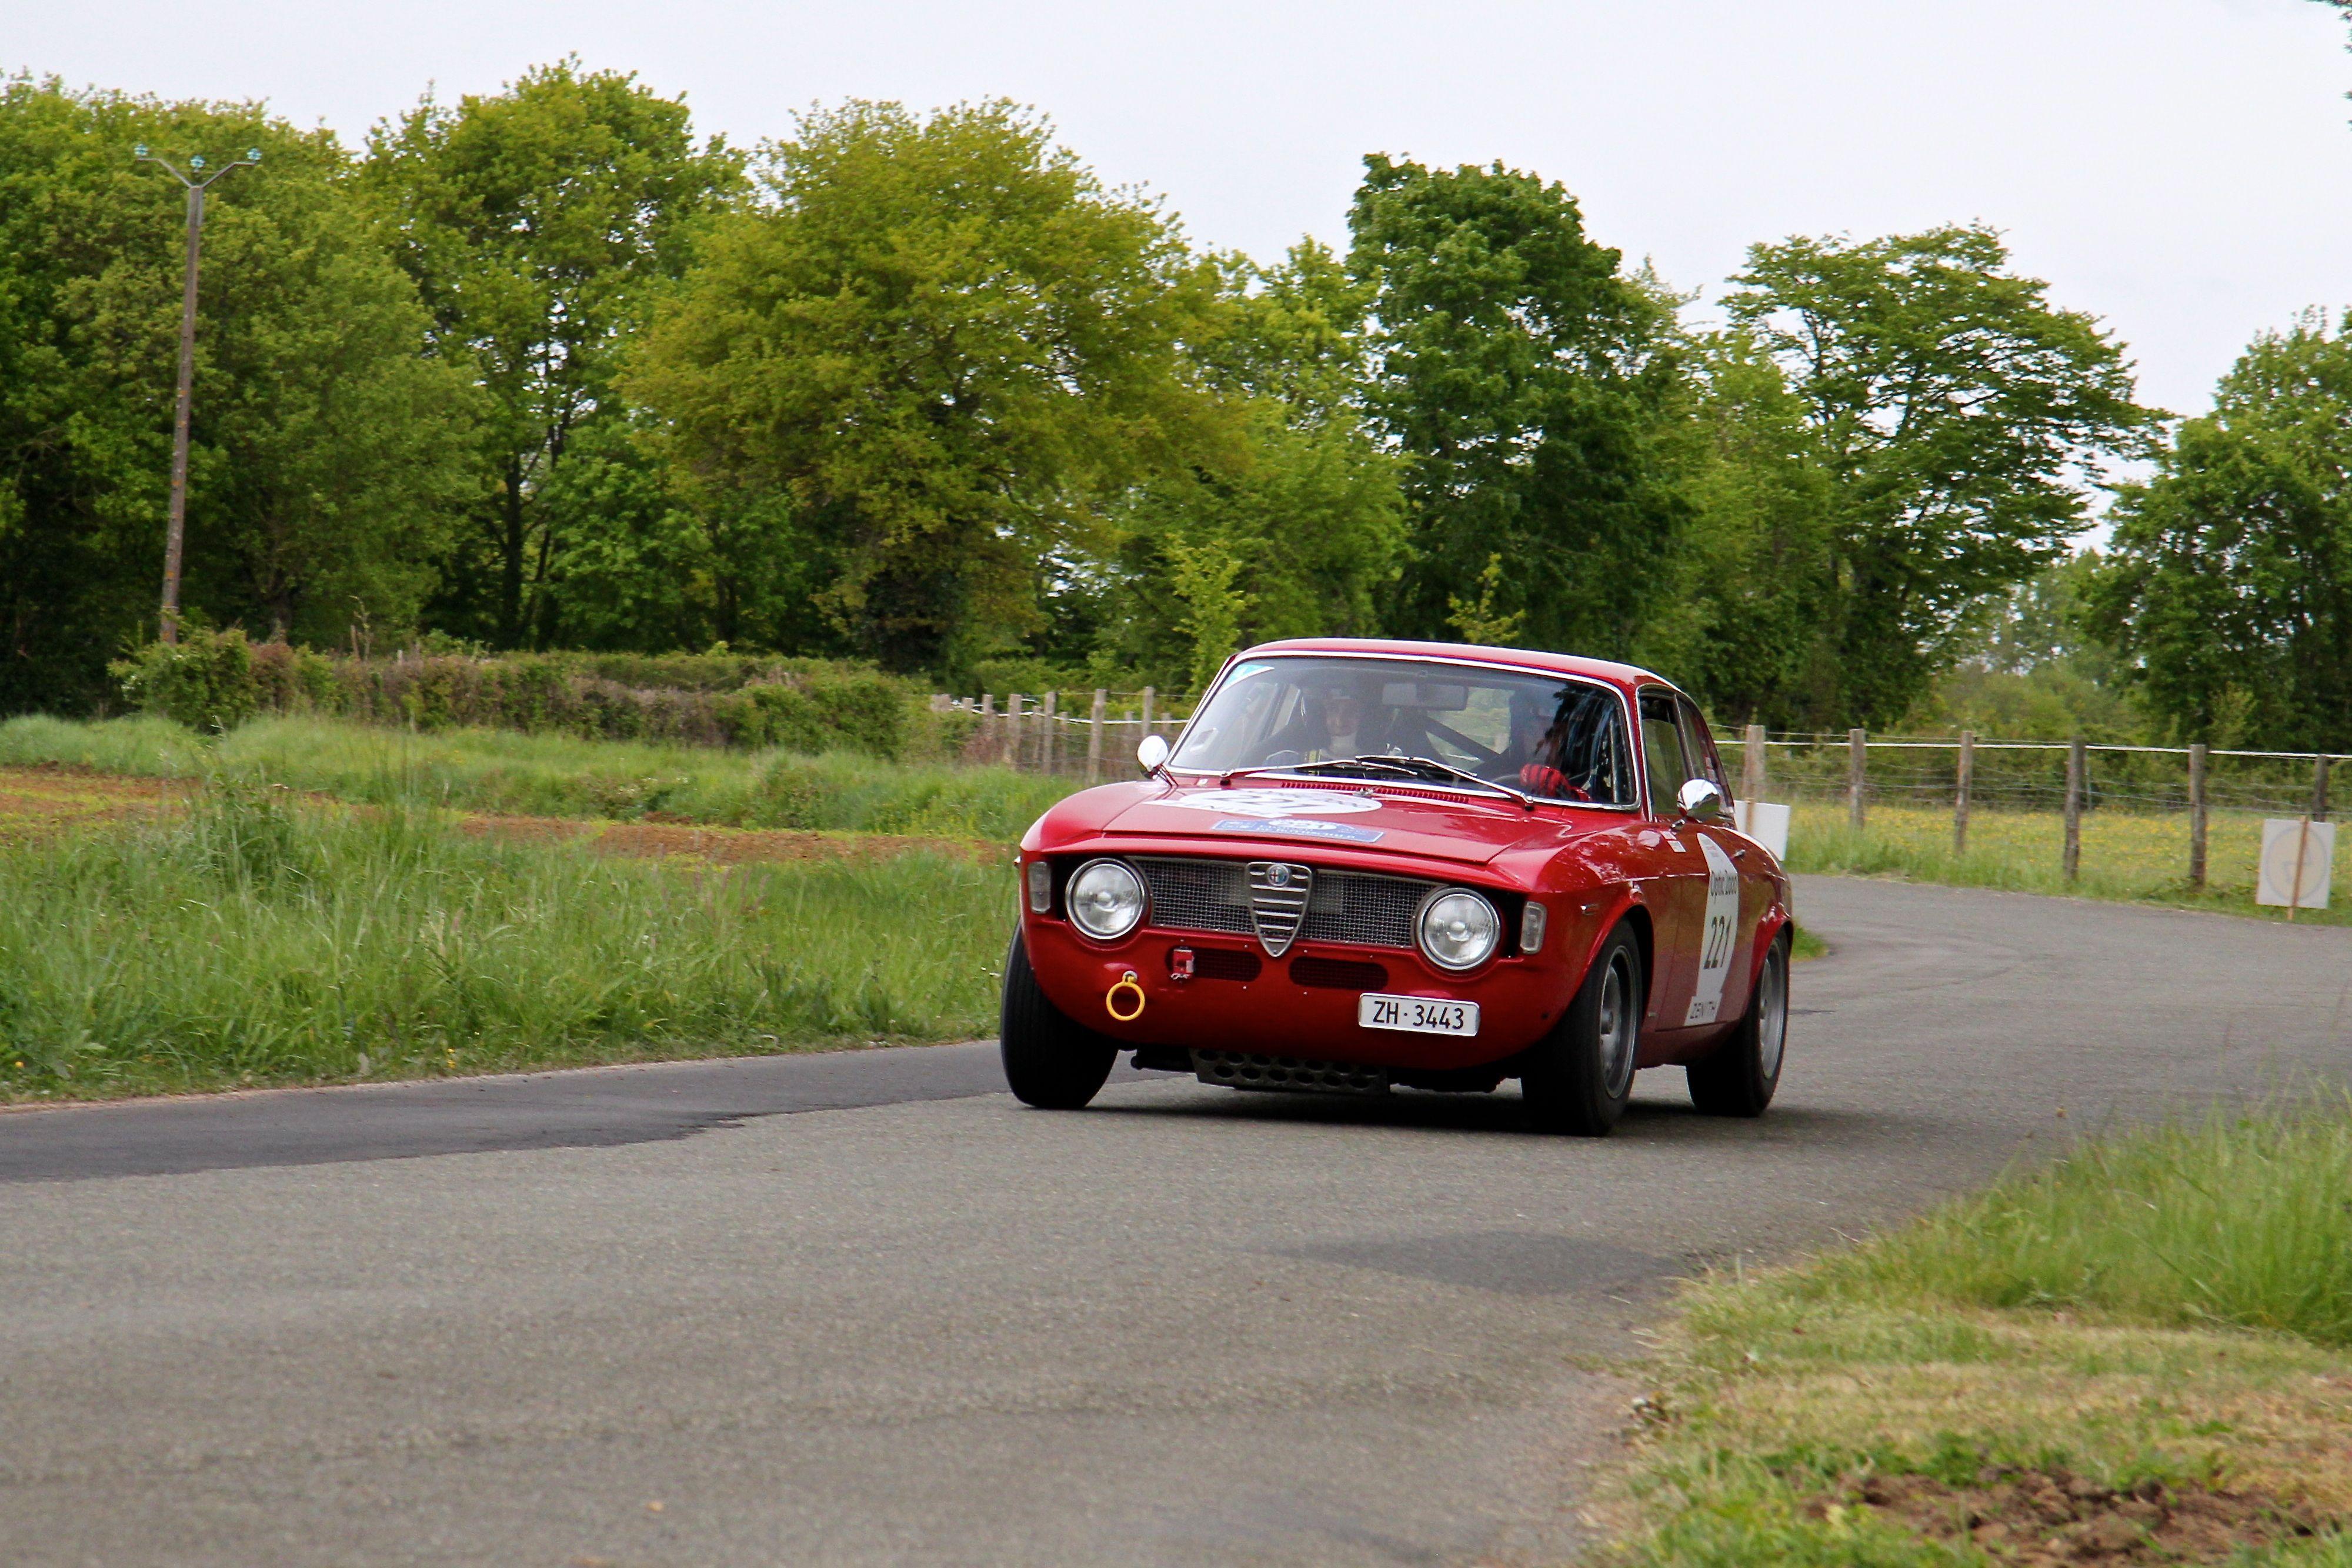 Alfa Romeo Giulia 1600 - GTA 1965 - départ - Tour Auto 2017 - photo Ludo Ferrari